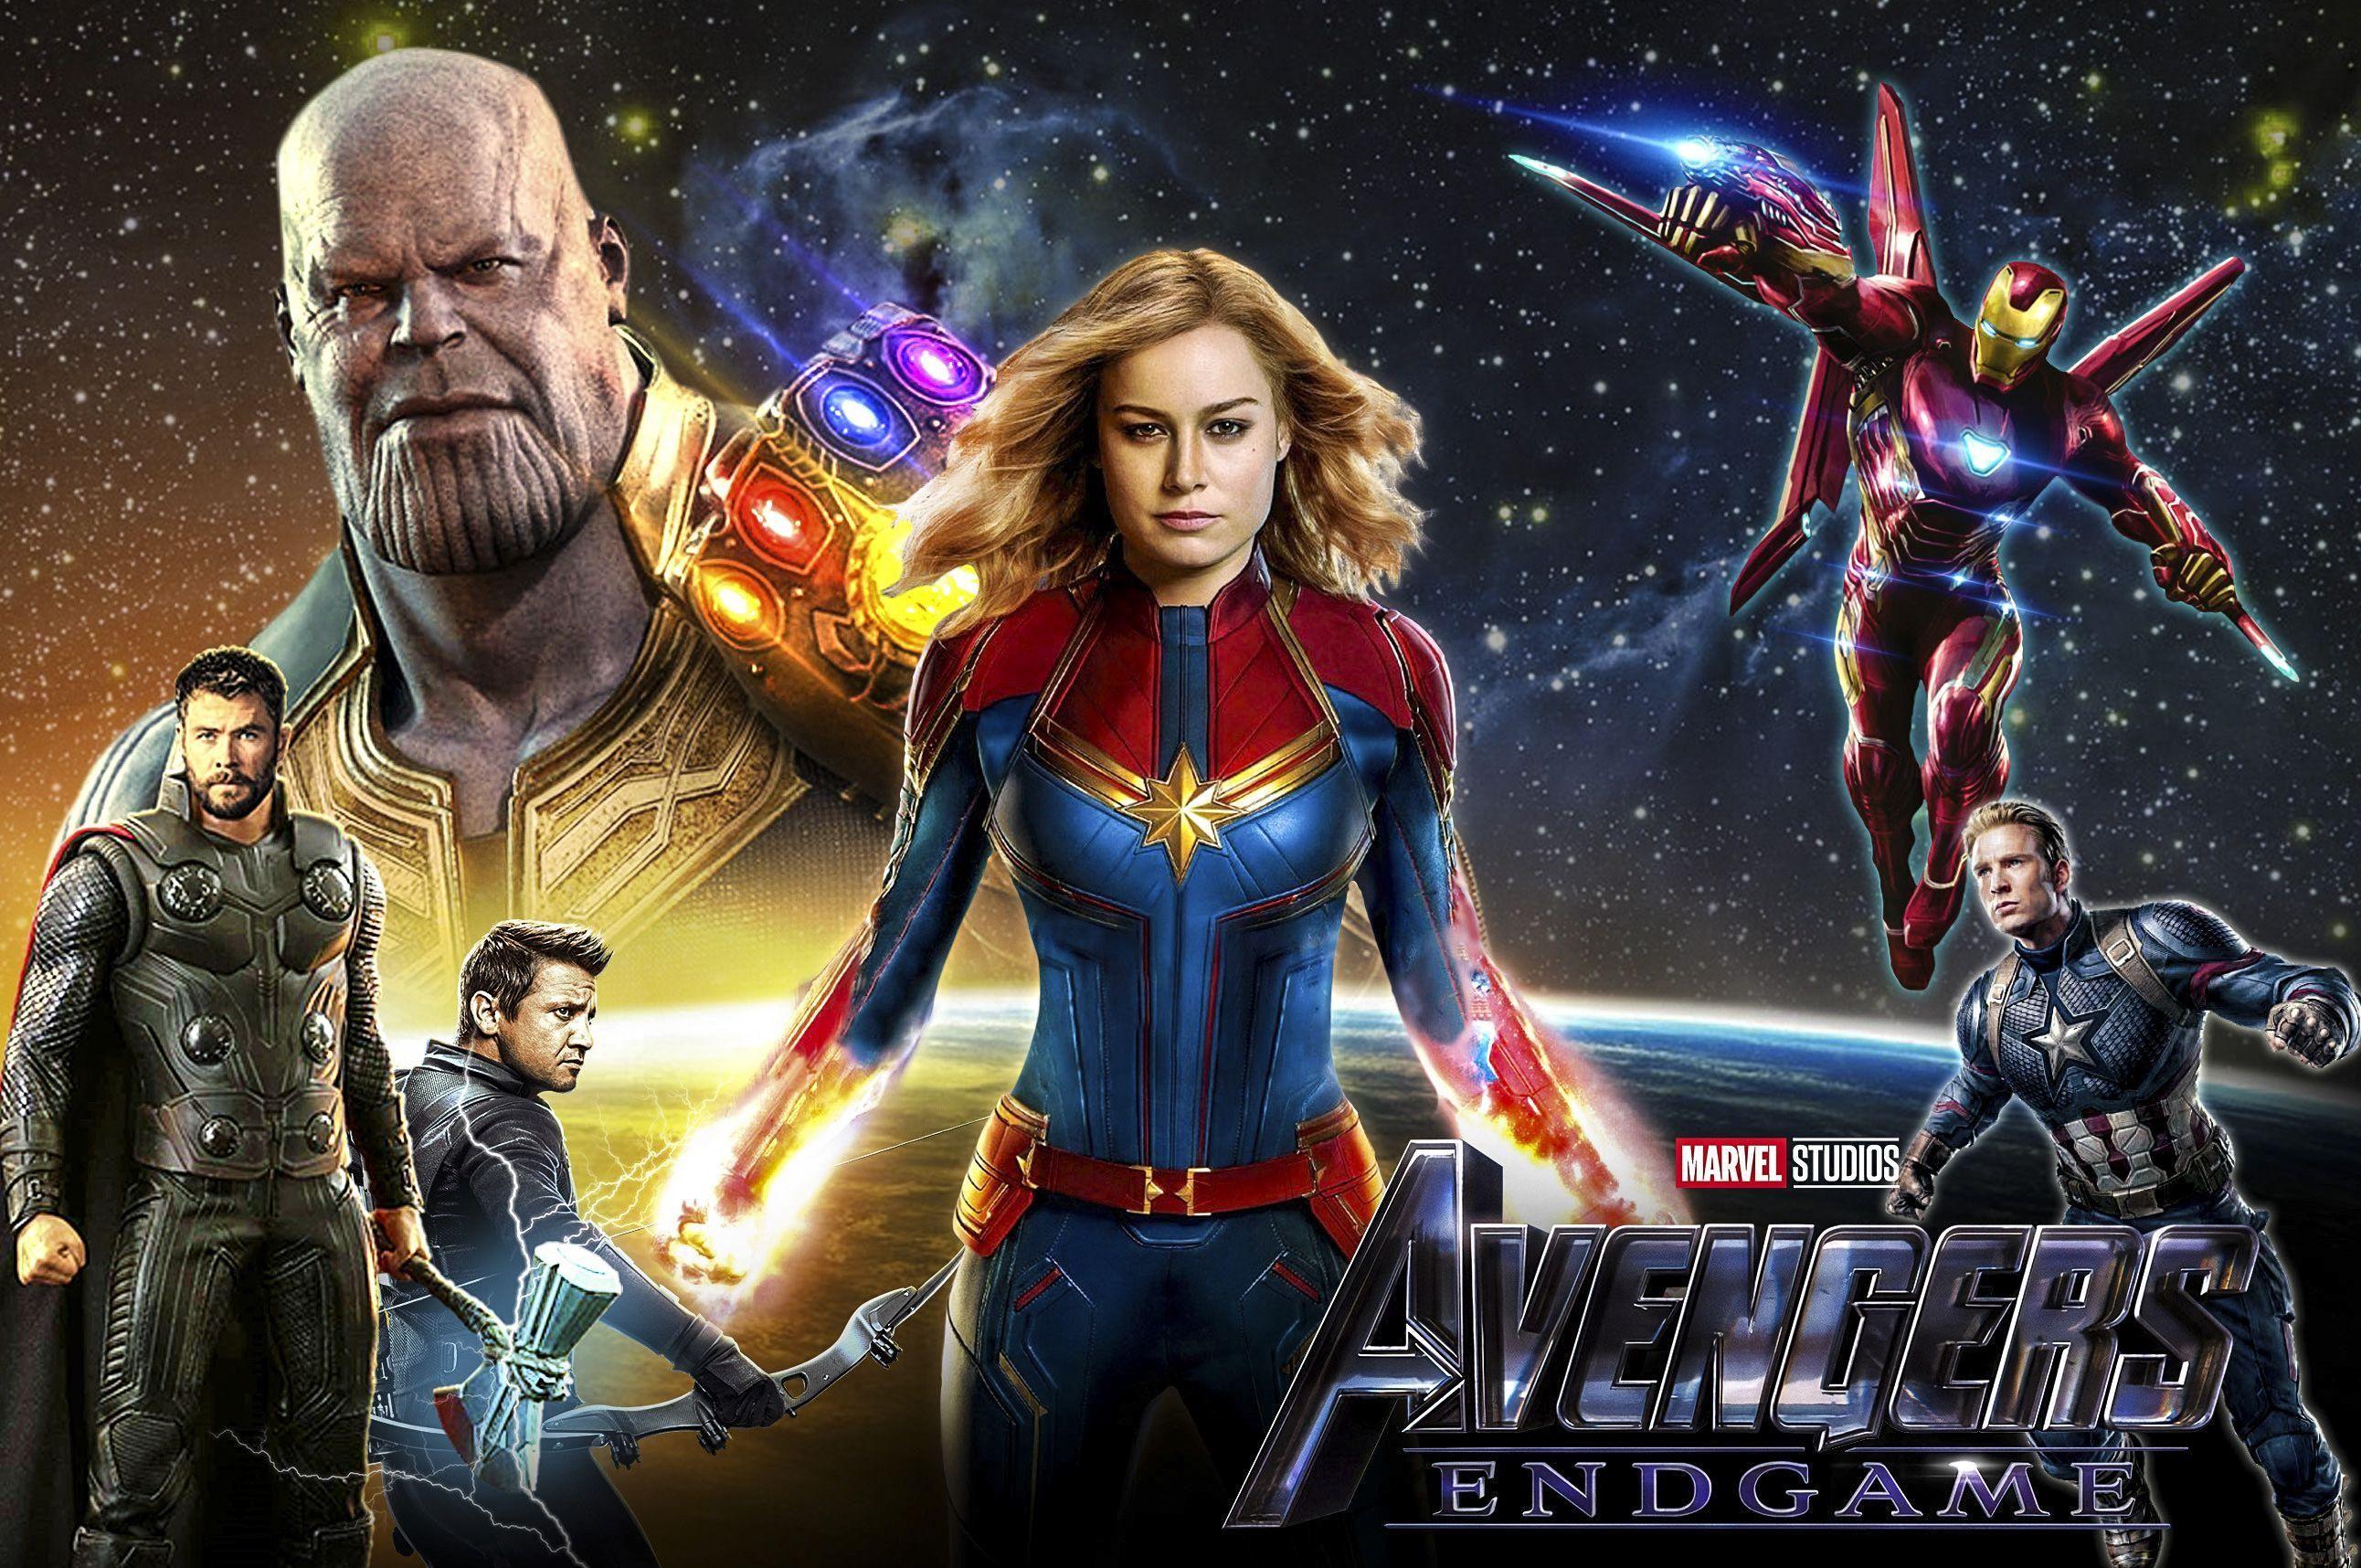 Avengers Endgame Wallpapers Wallpaper Cave In 2020 Thor Wallpaper Avengers Wallpaper Movie Wallpapers